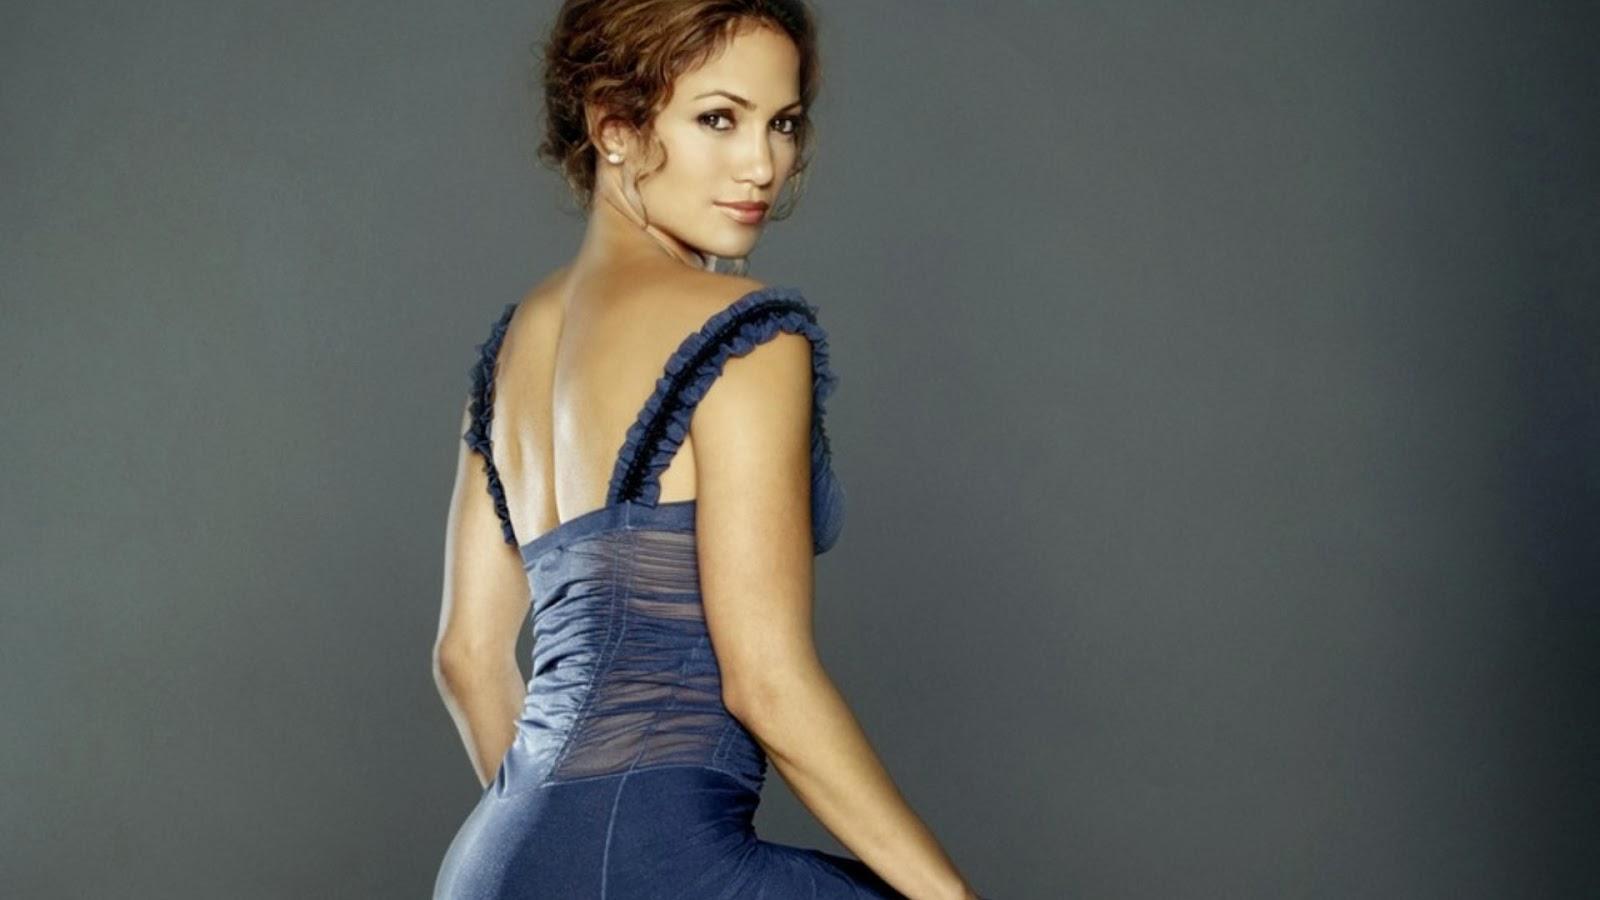 American Singer Jennifer Lopez Hd Photos  Lifestyles 717-6752